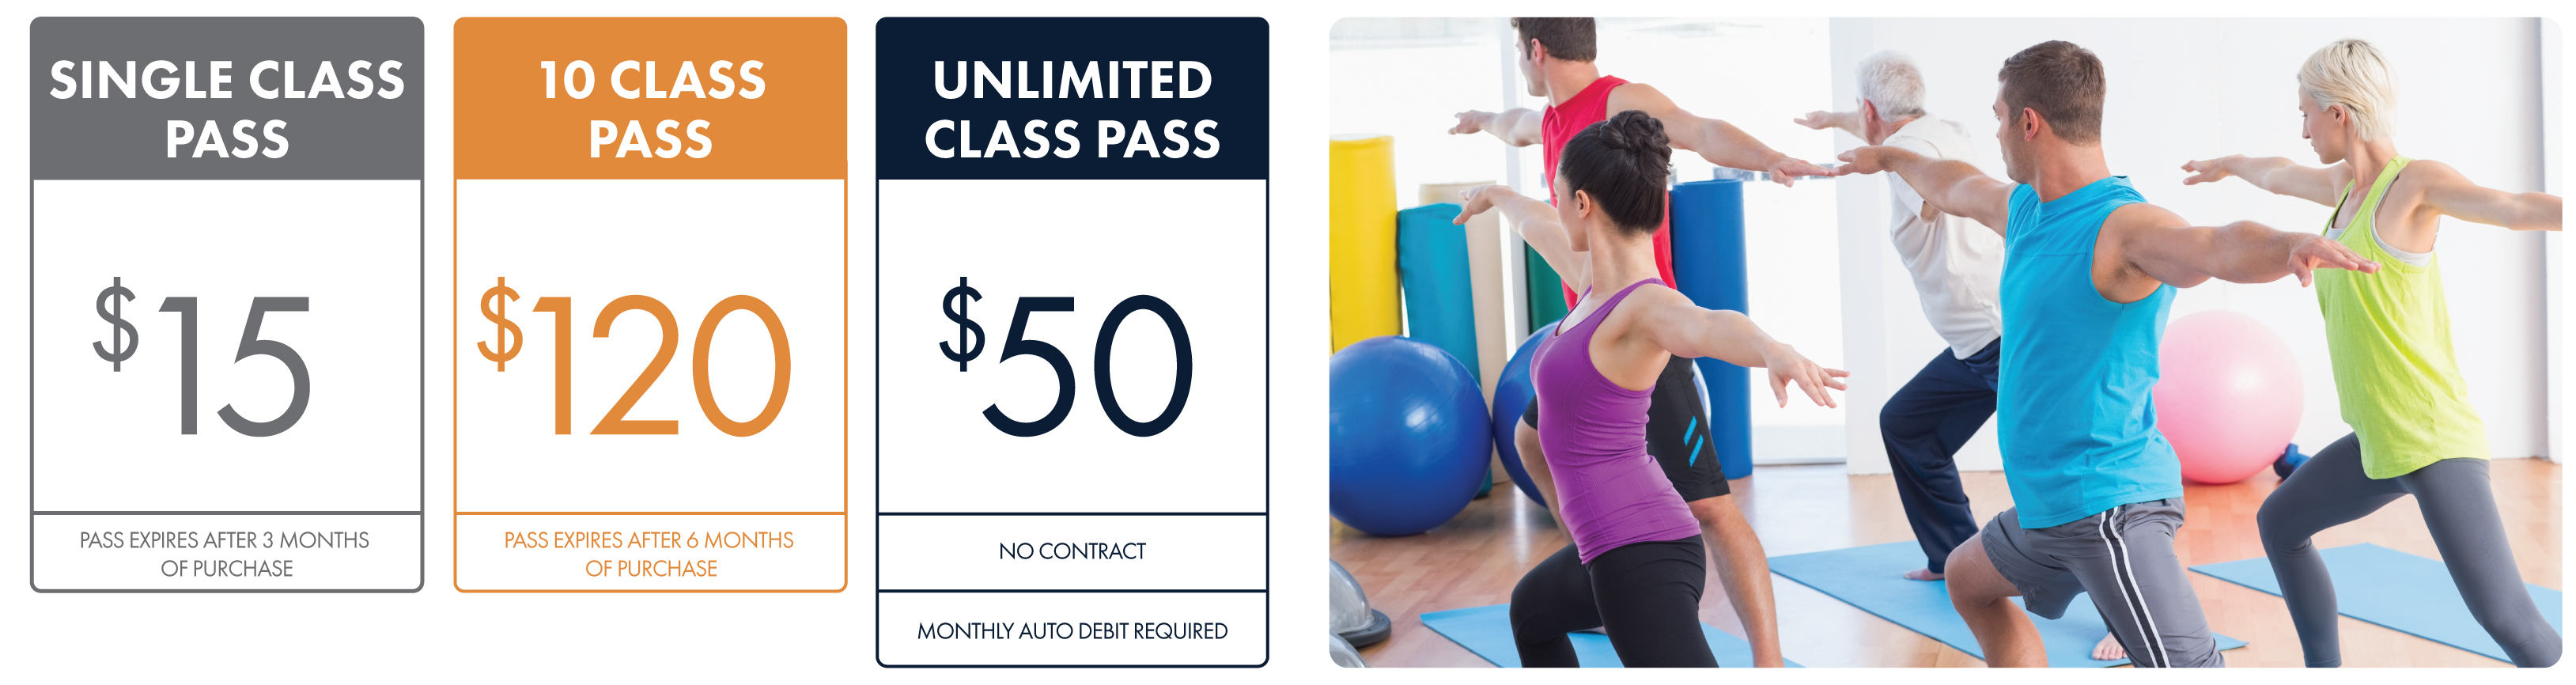 Yoga-Pricing-and-Image